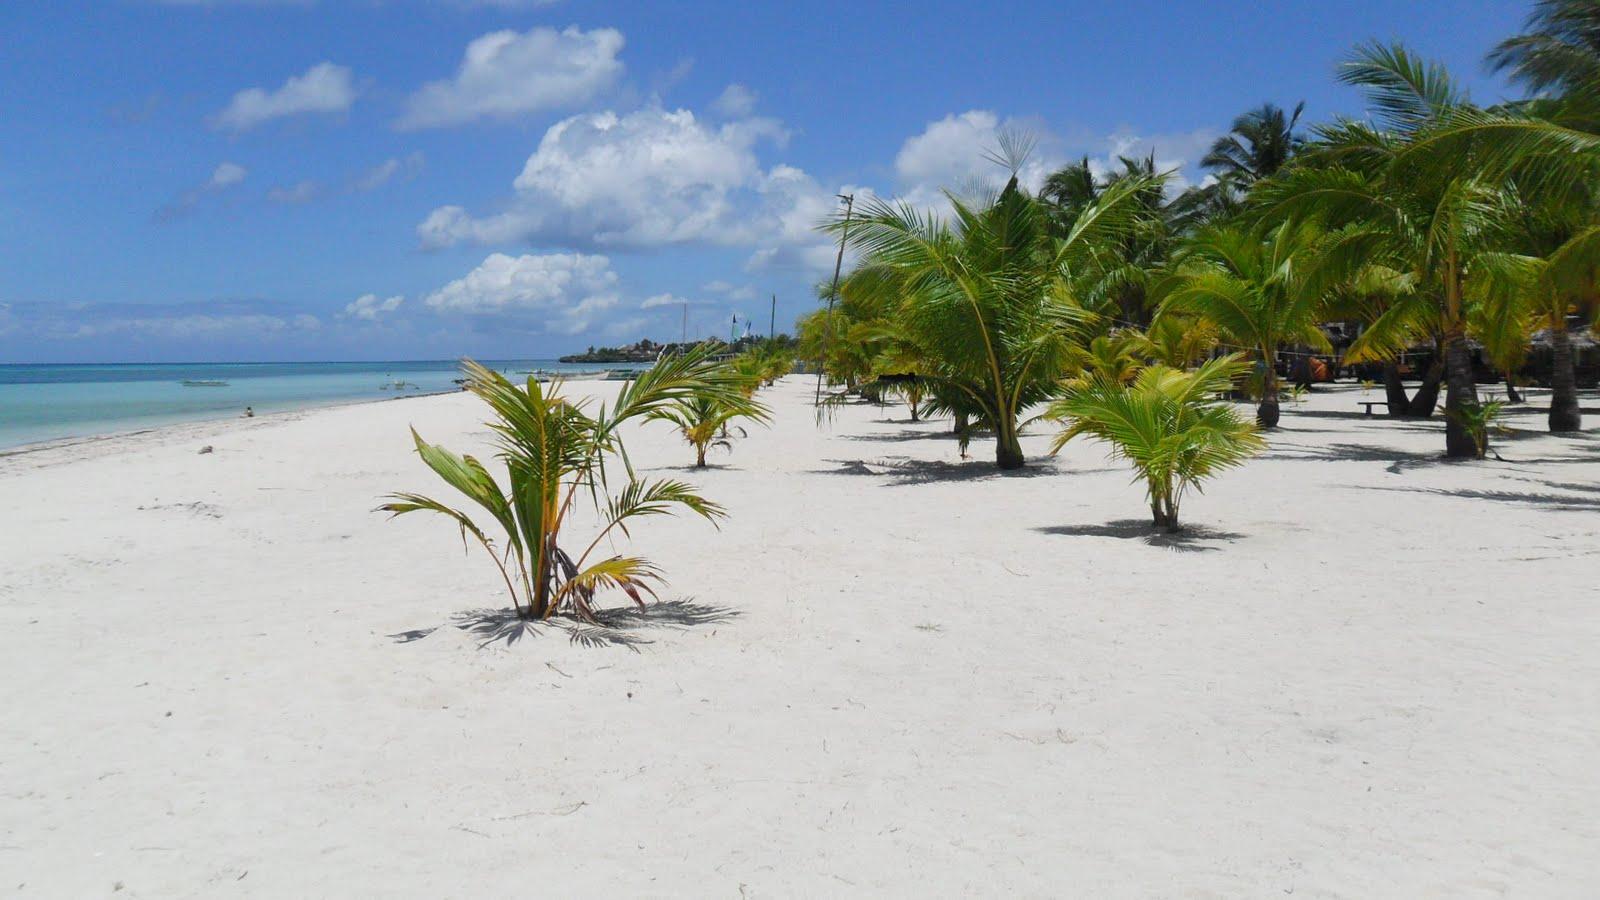 cebu image island hotels travel destination and  sta fe beach resort bantayan island #5